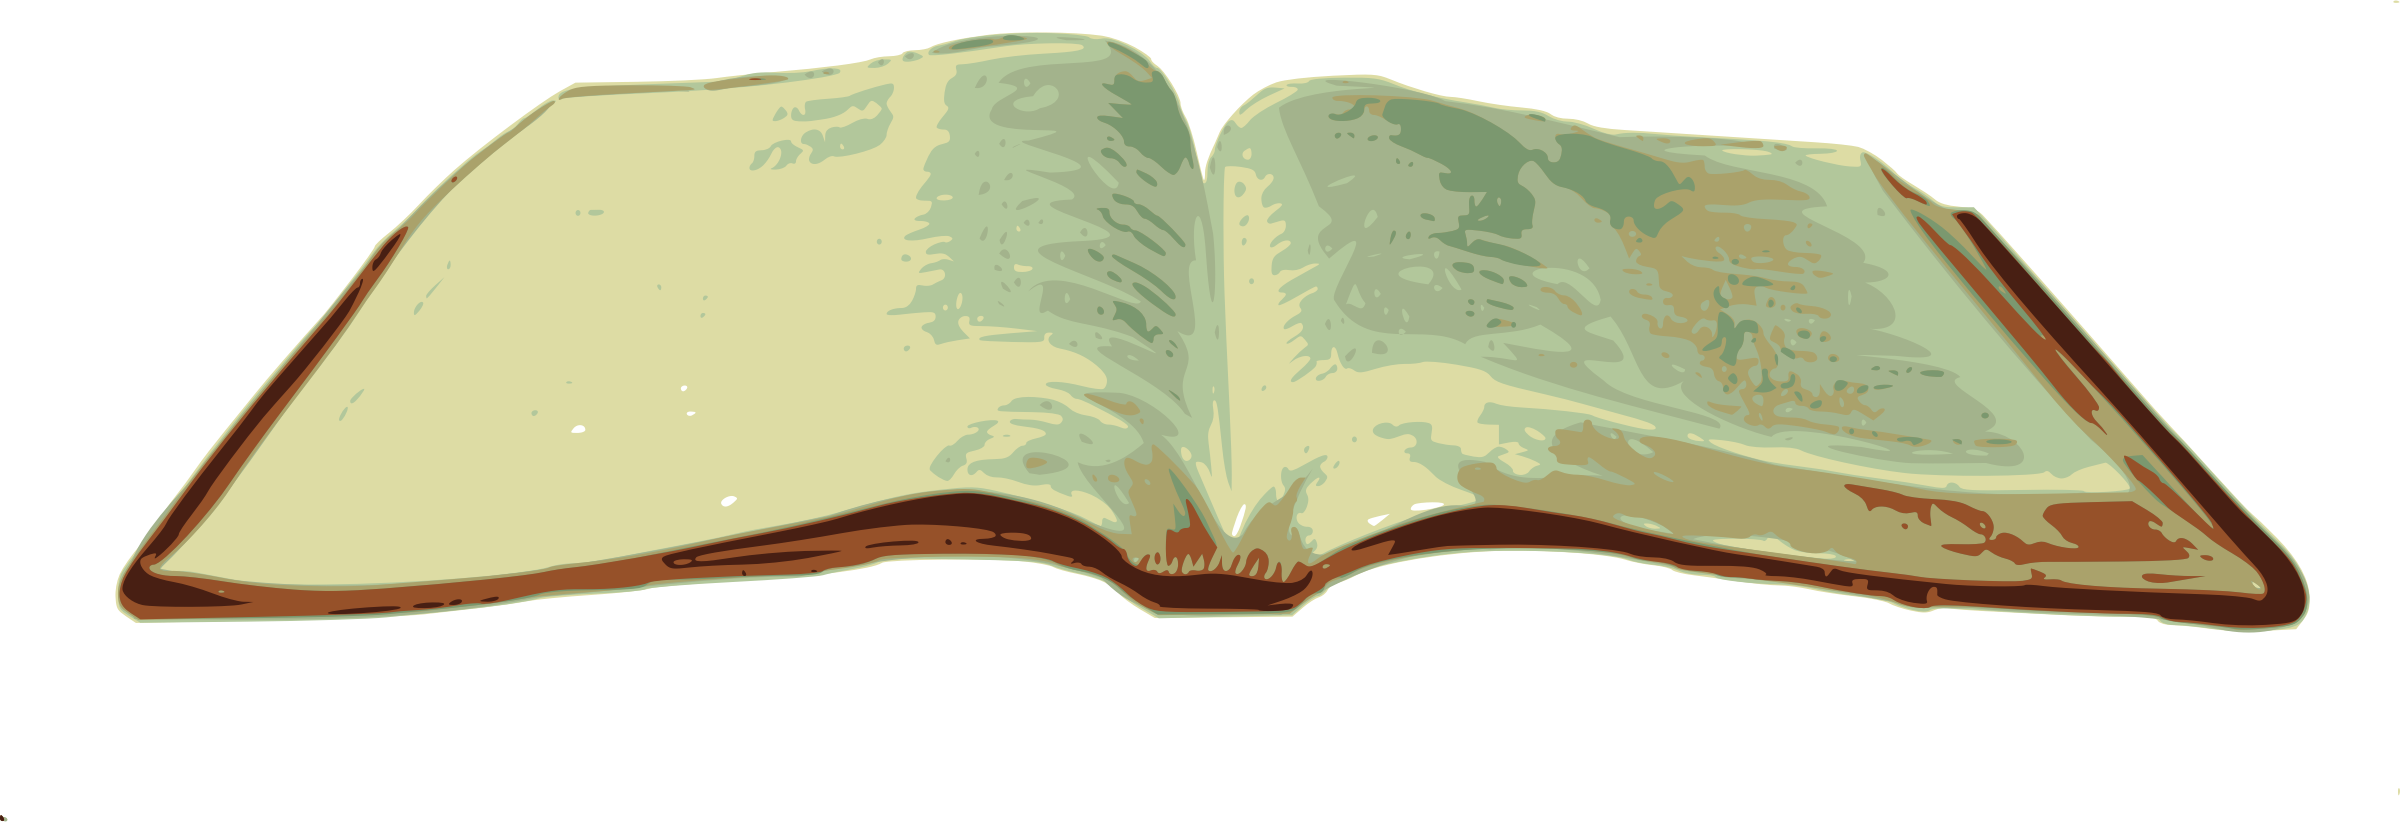 2400x822 Scripture Clipart Open Bible